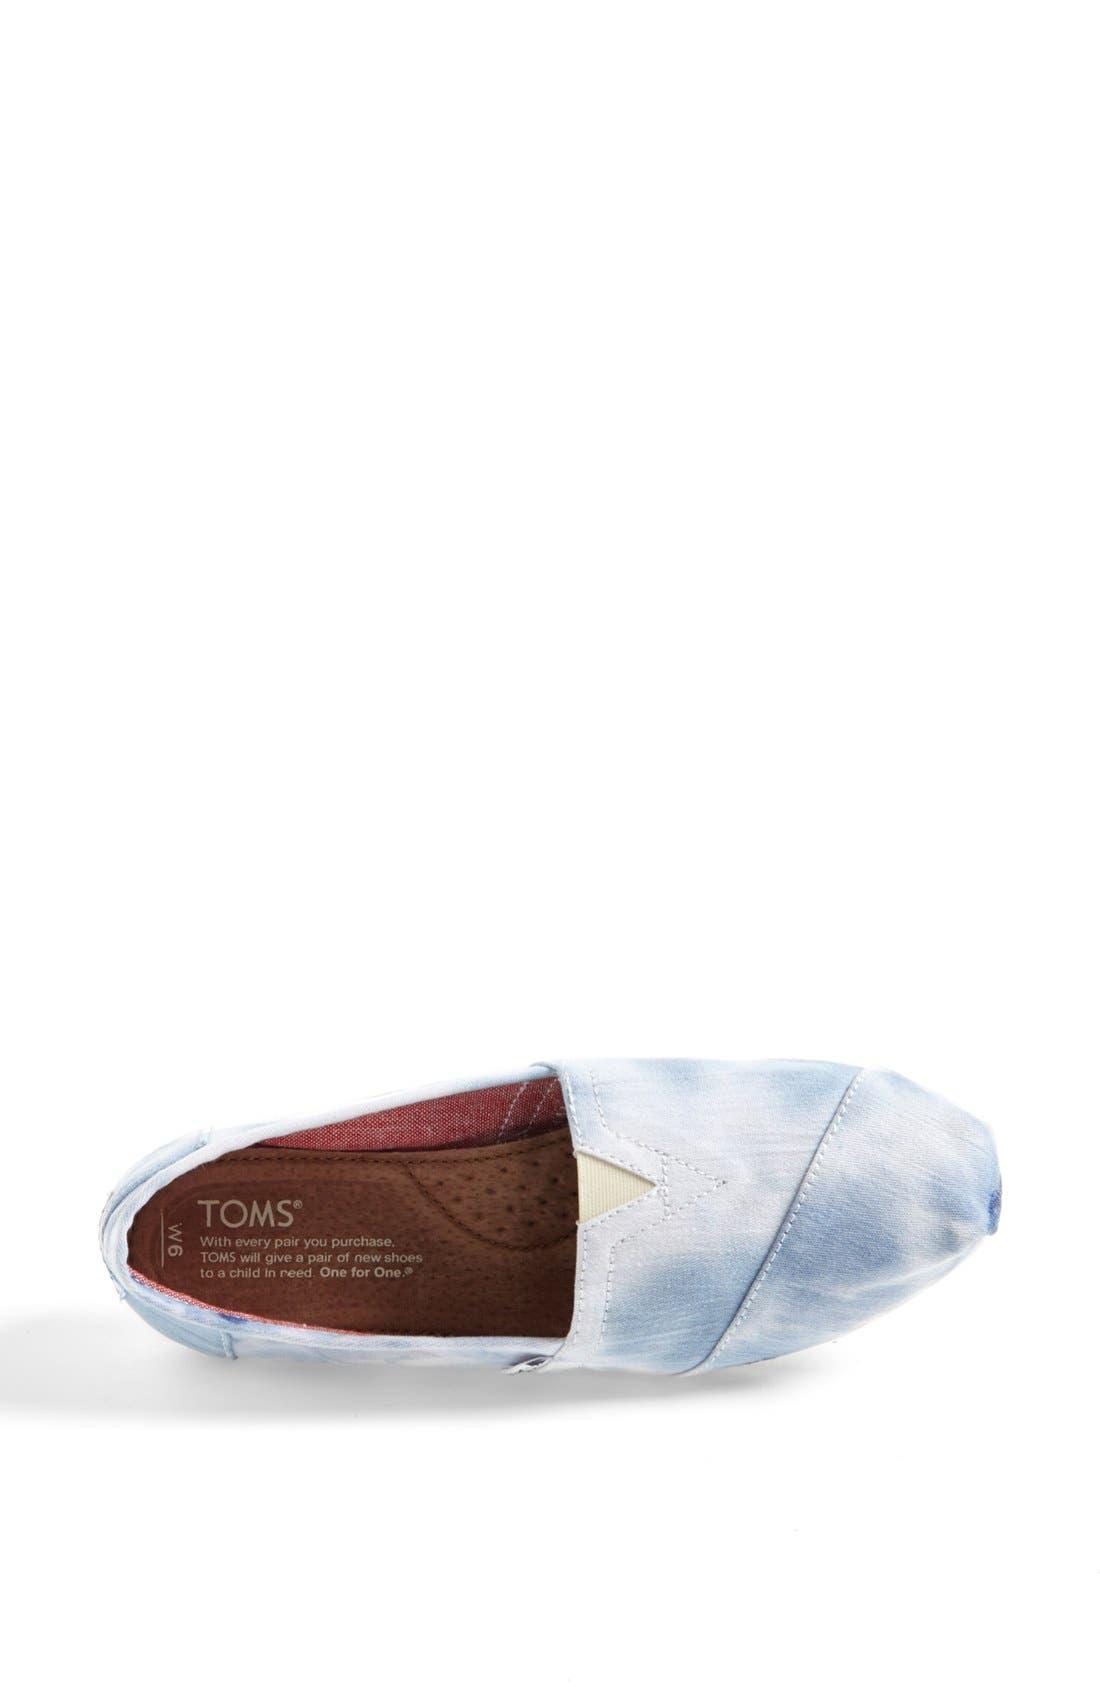 Alternate Image 3  - TOMS 'Classic - Tie Dye' Slip-On (Women)